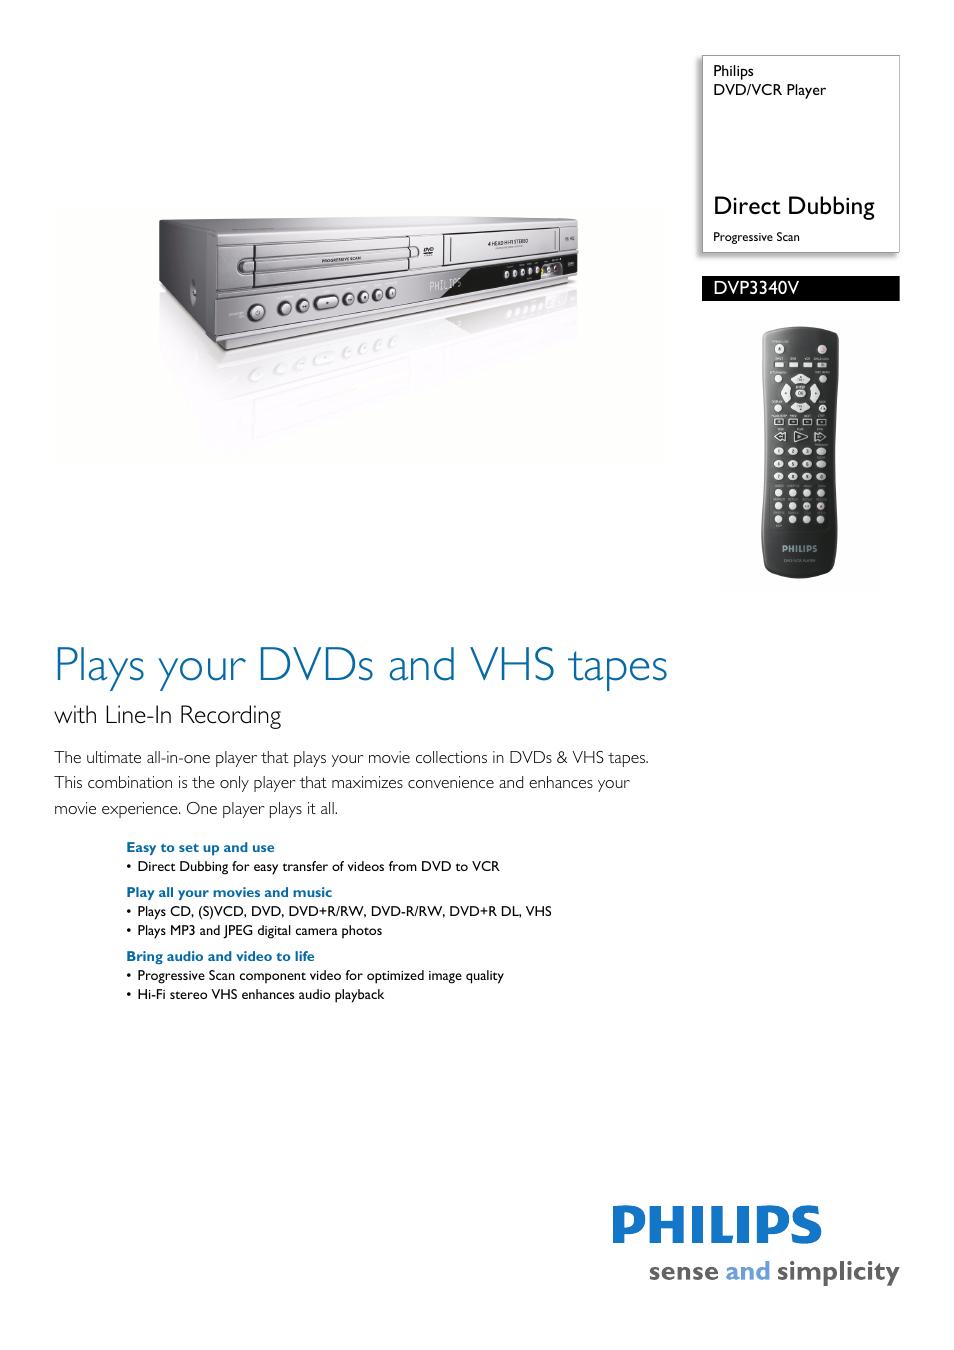 philips dvd vcr player dvp3340v direct dubbing progressive scan user rh manualsdir com Funai DVD Player Sony DVD Player